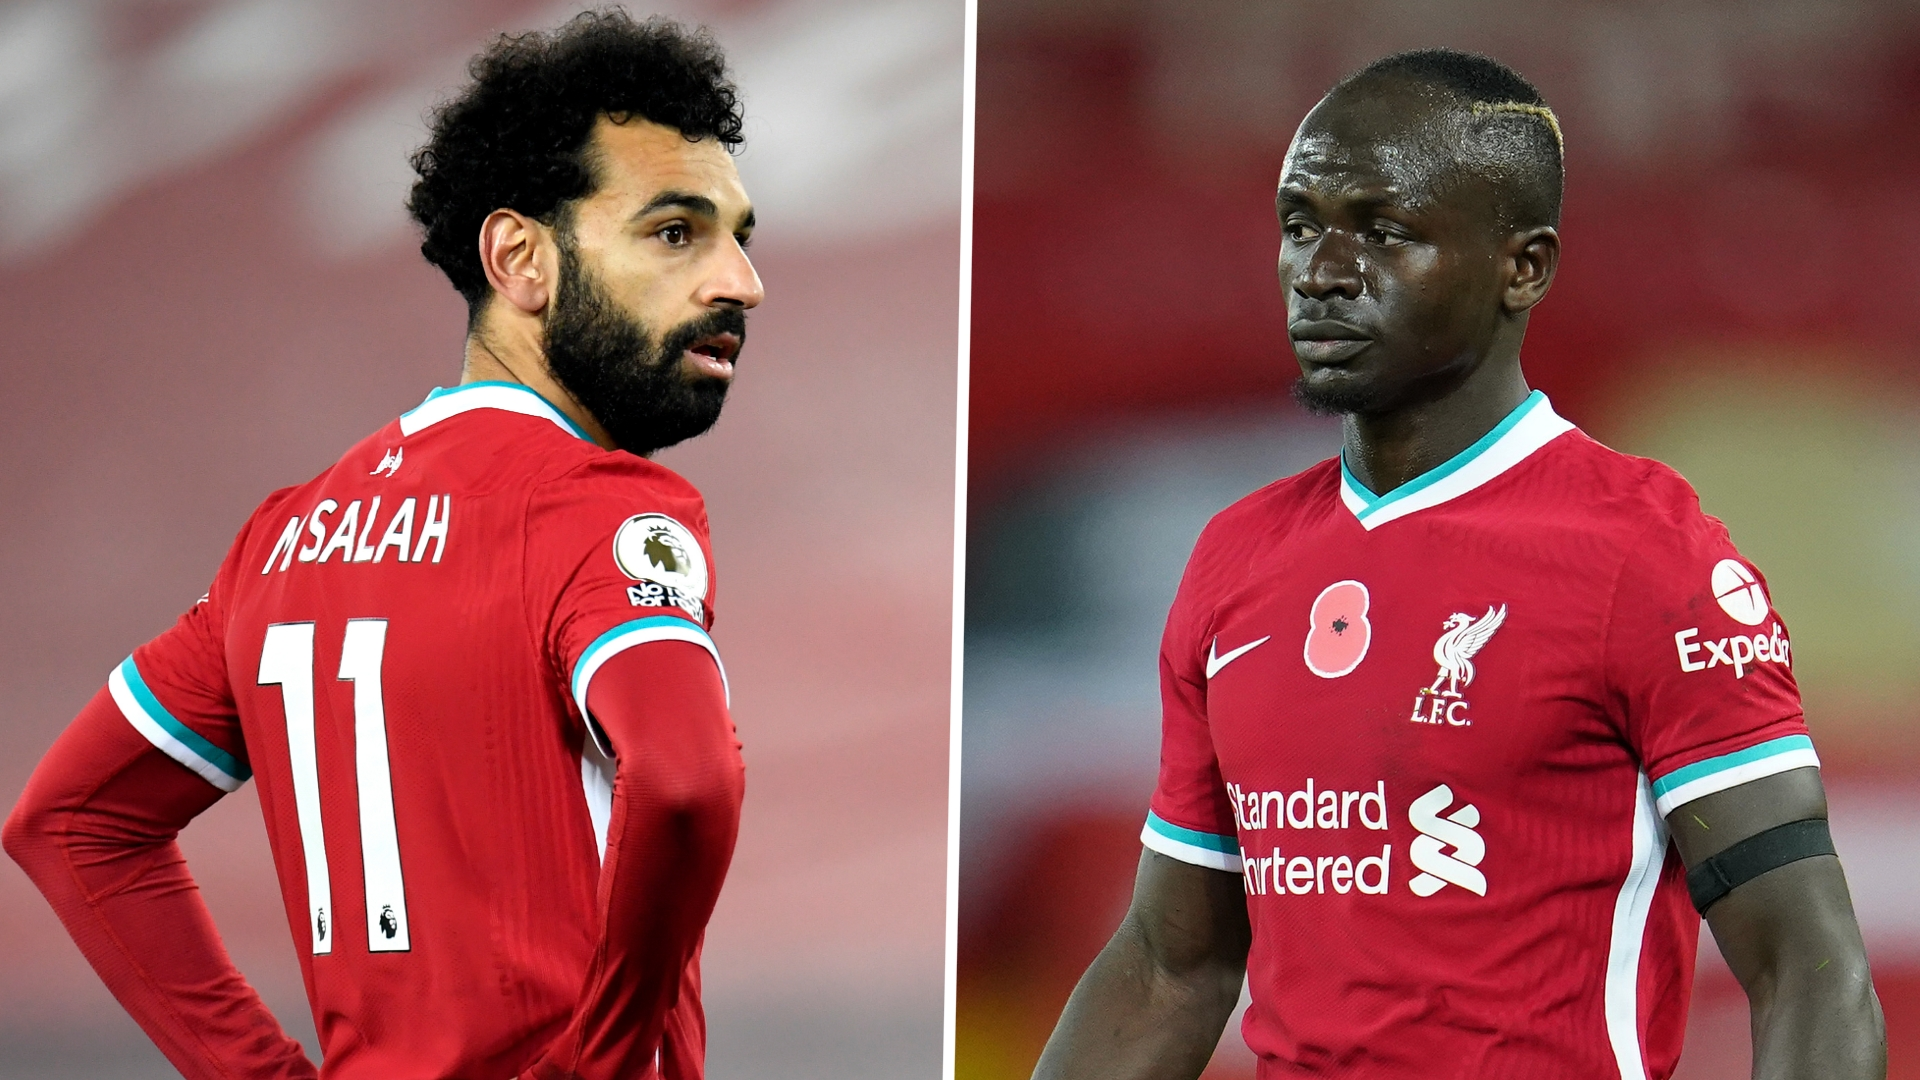 Fan View: Salah, not Mane, deserved Ballon d'Or